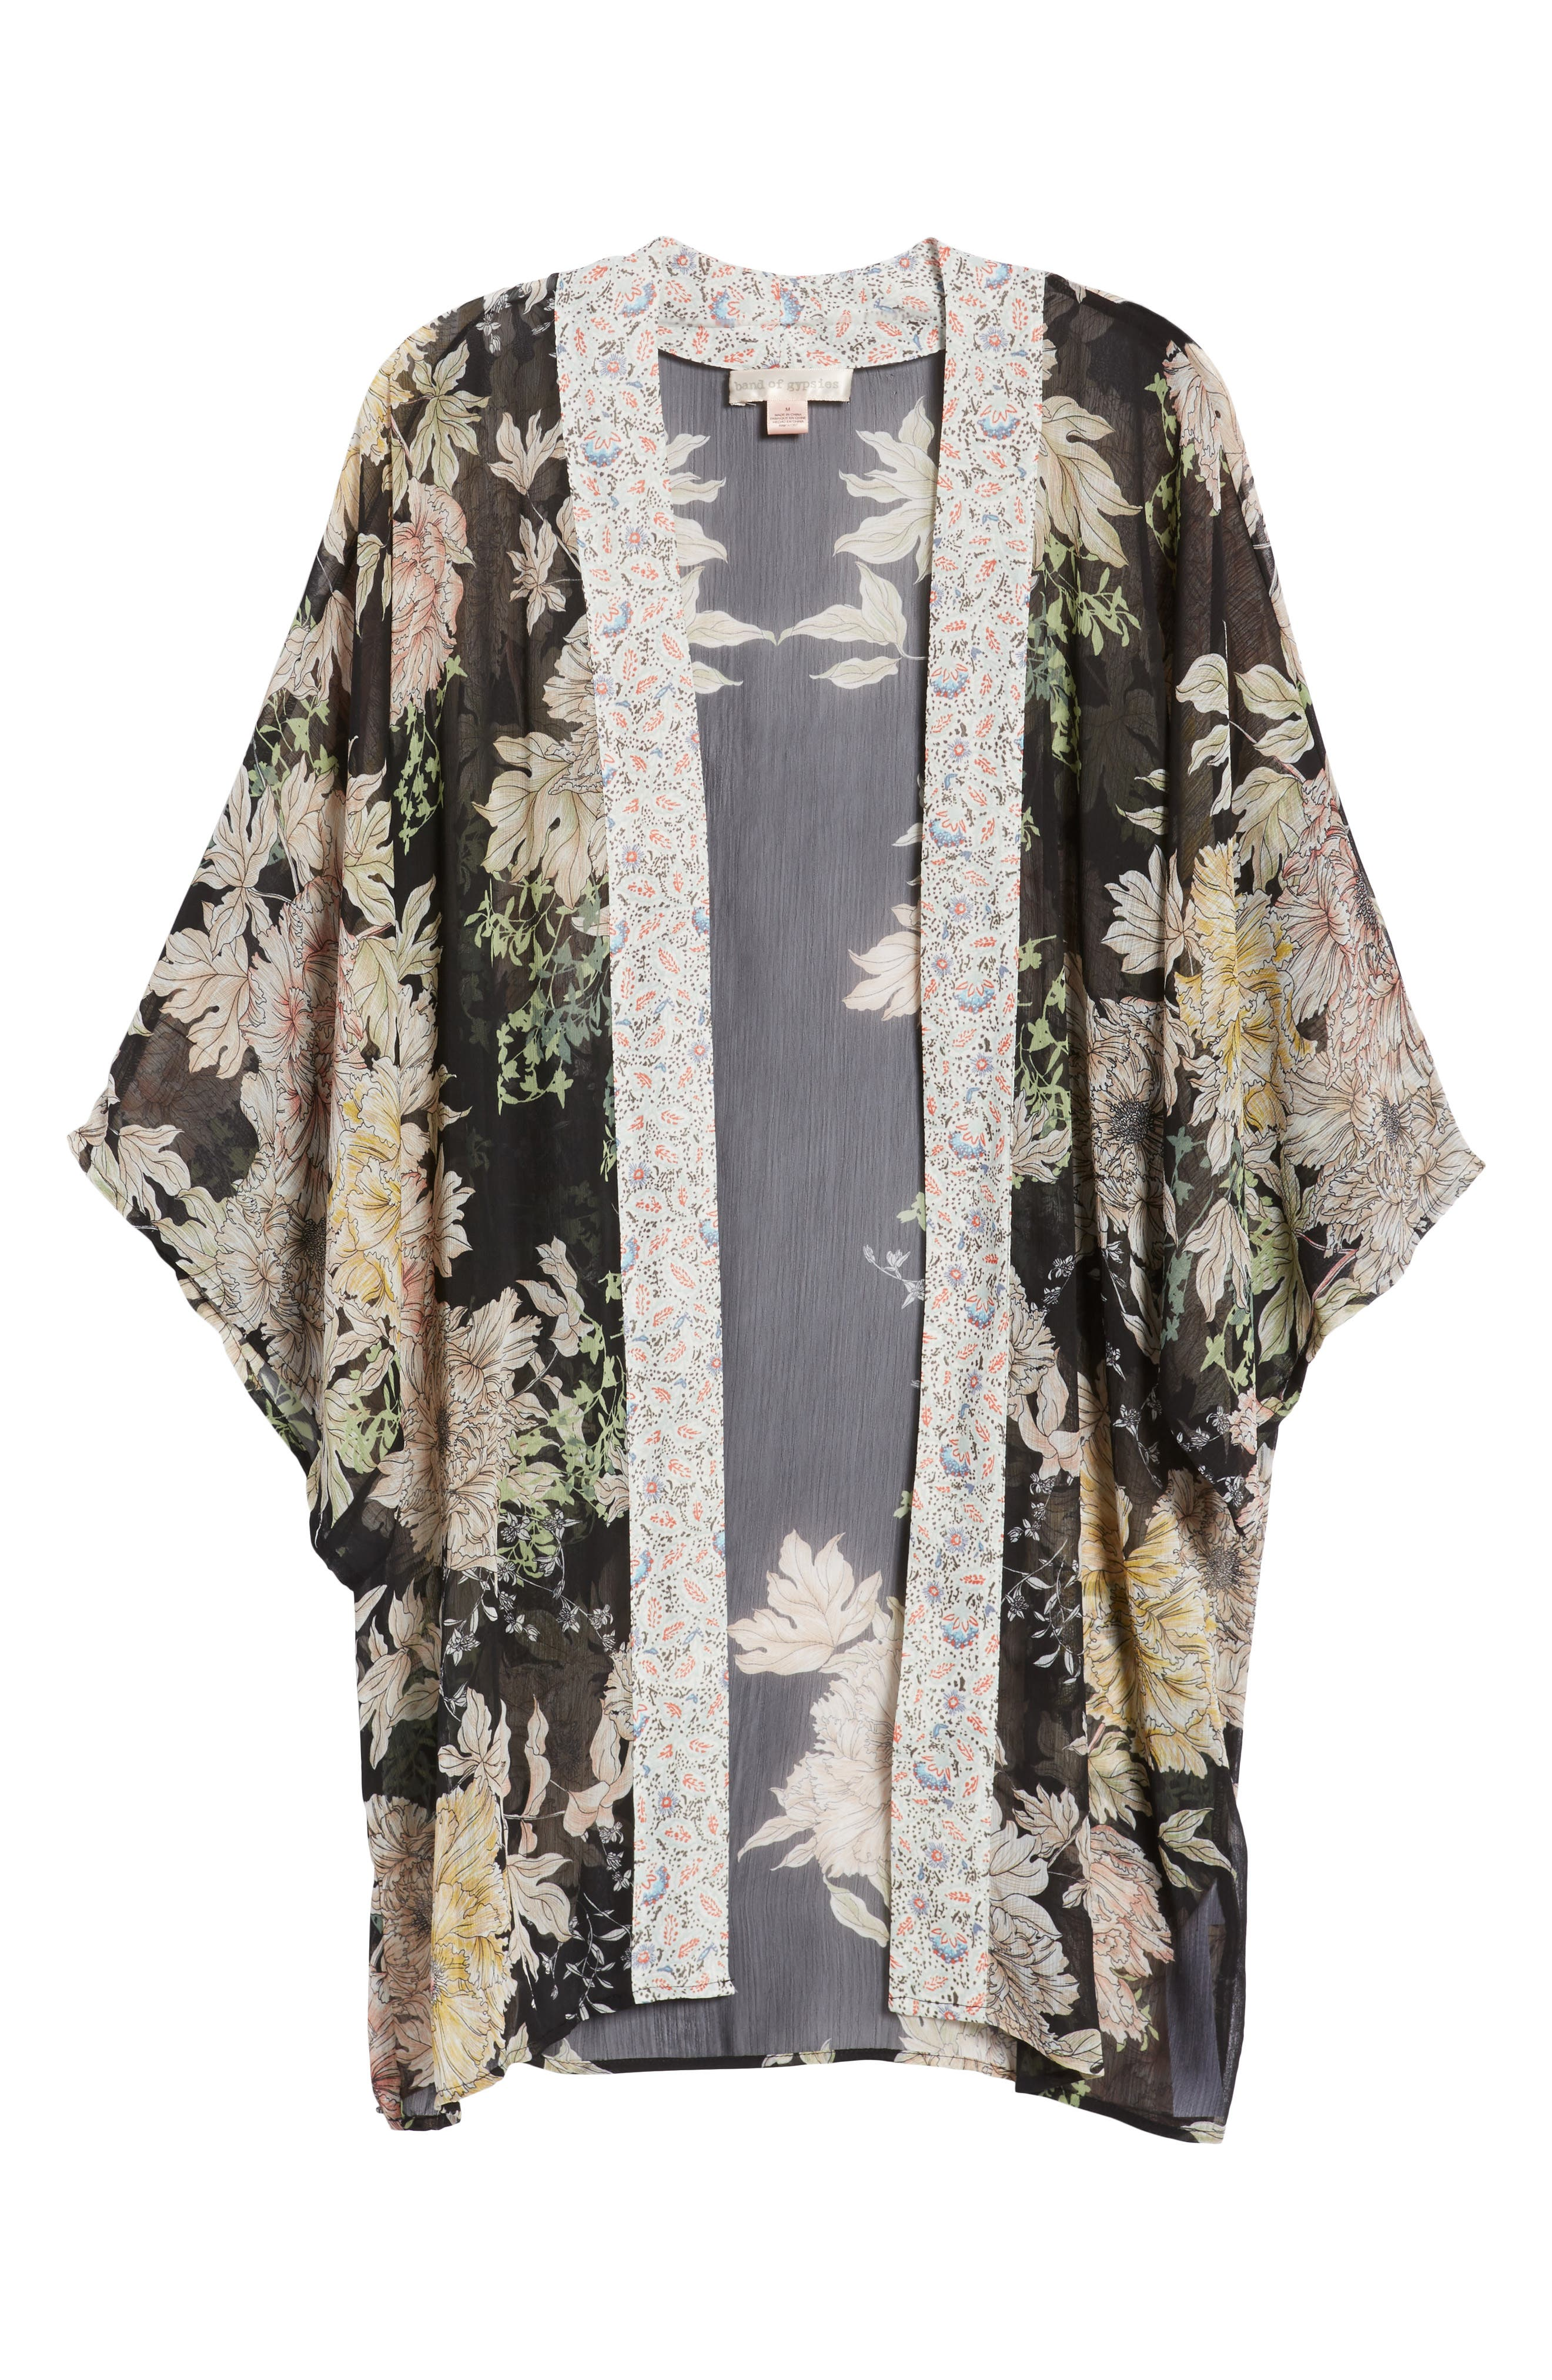 Floral Print Kimono,                             Alternate thumbnail 7, color,                             Black Gold Pink